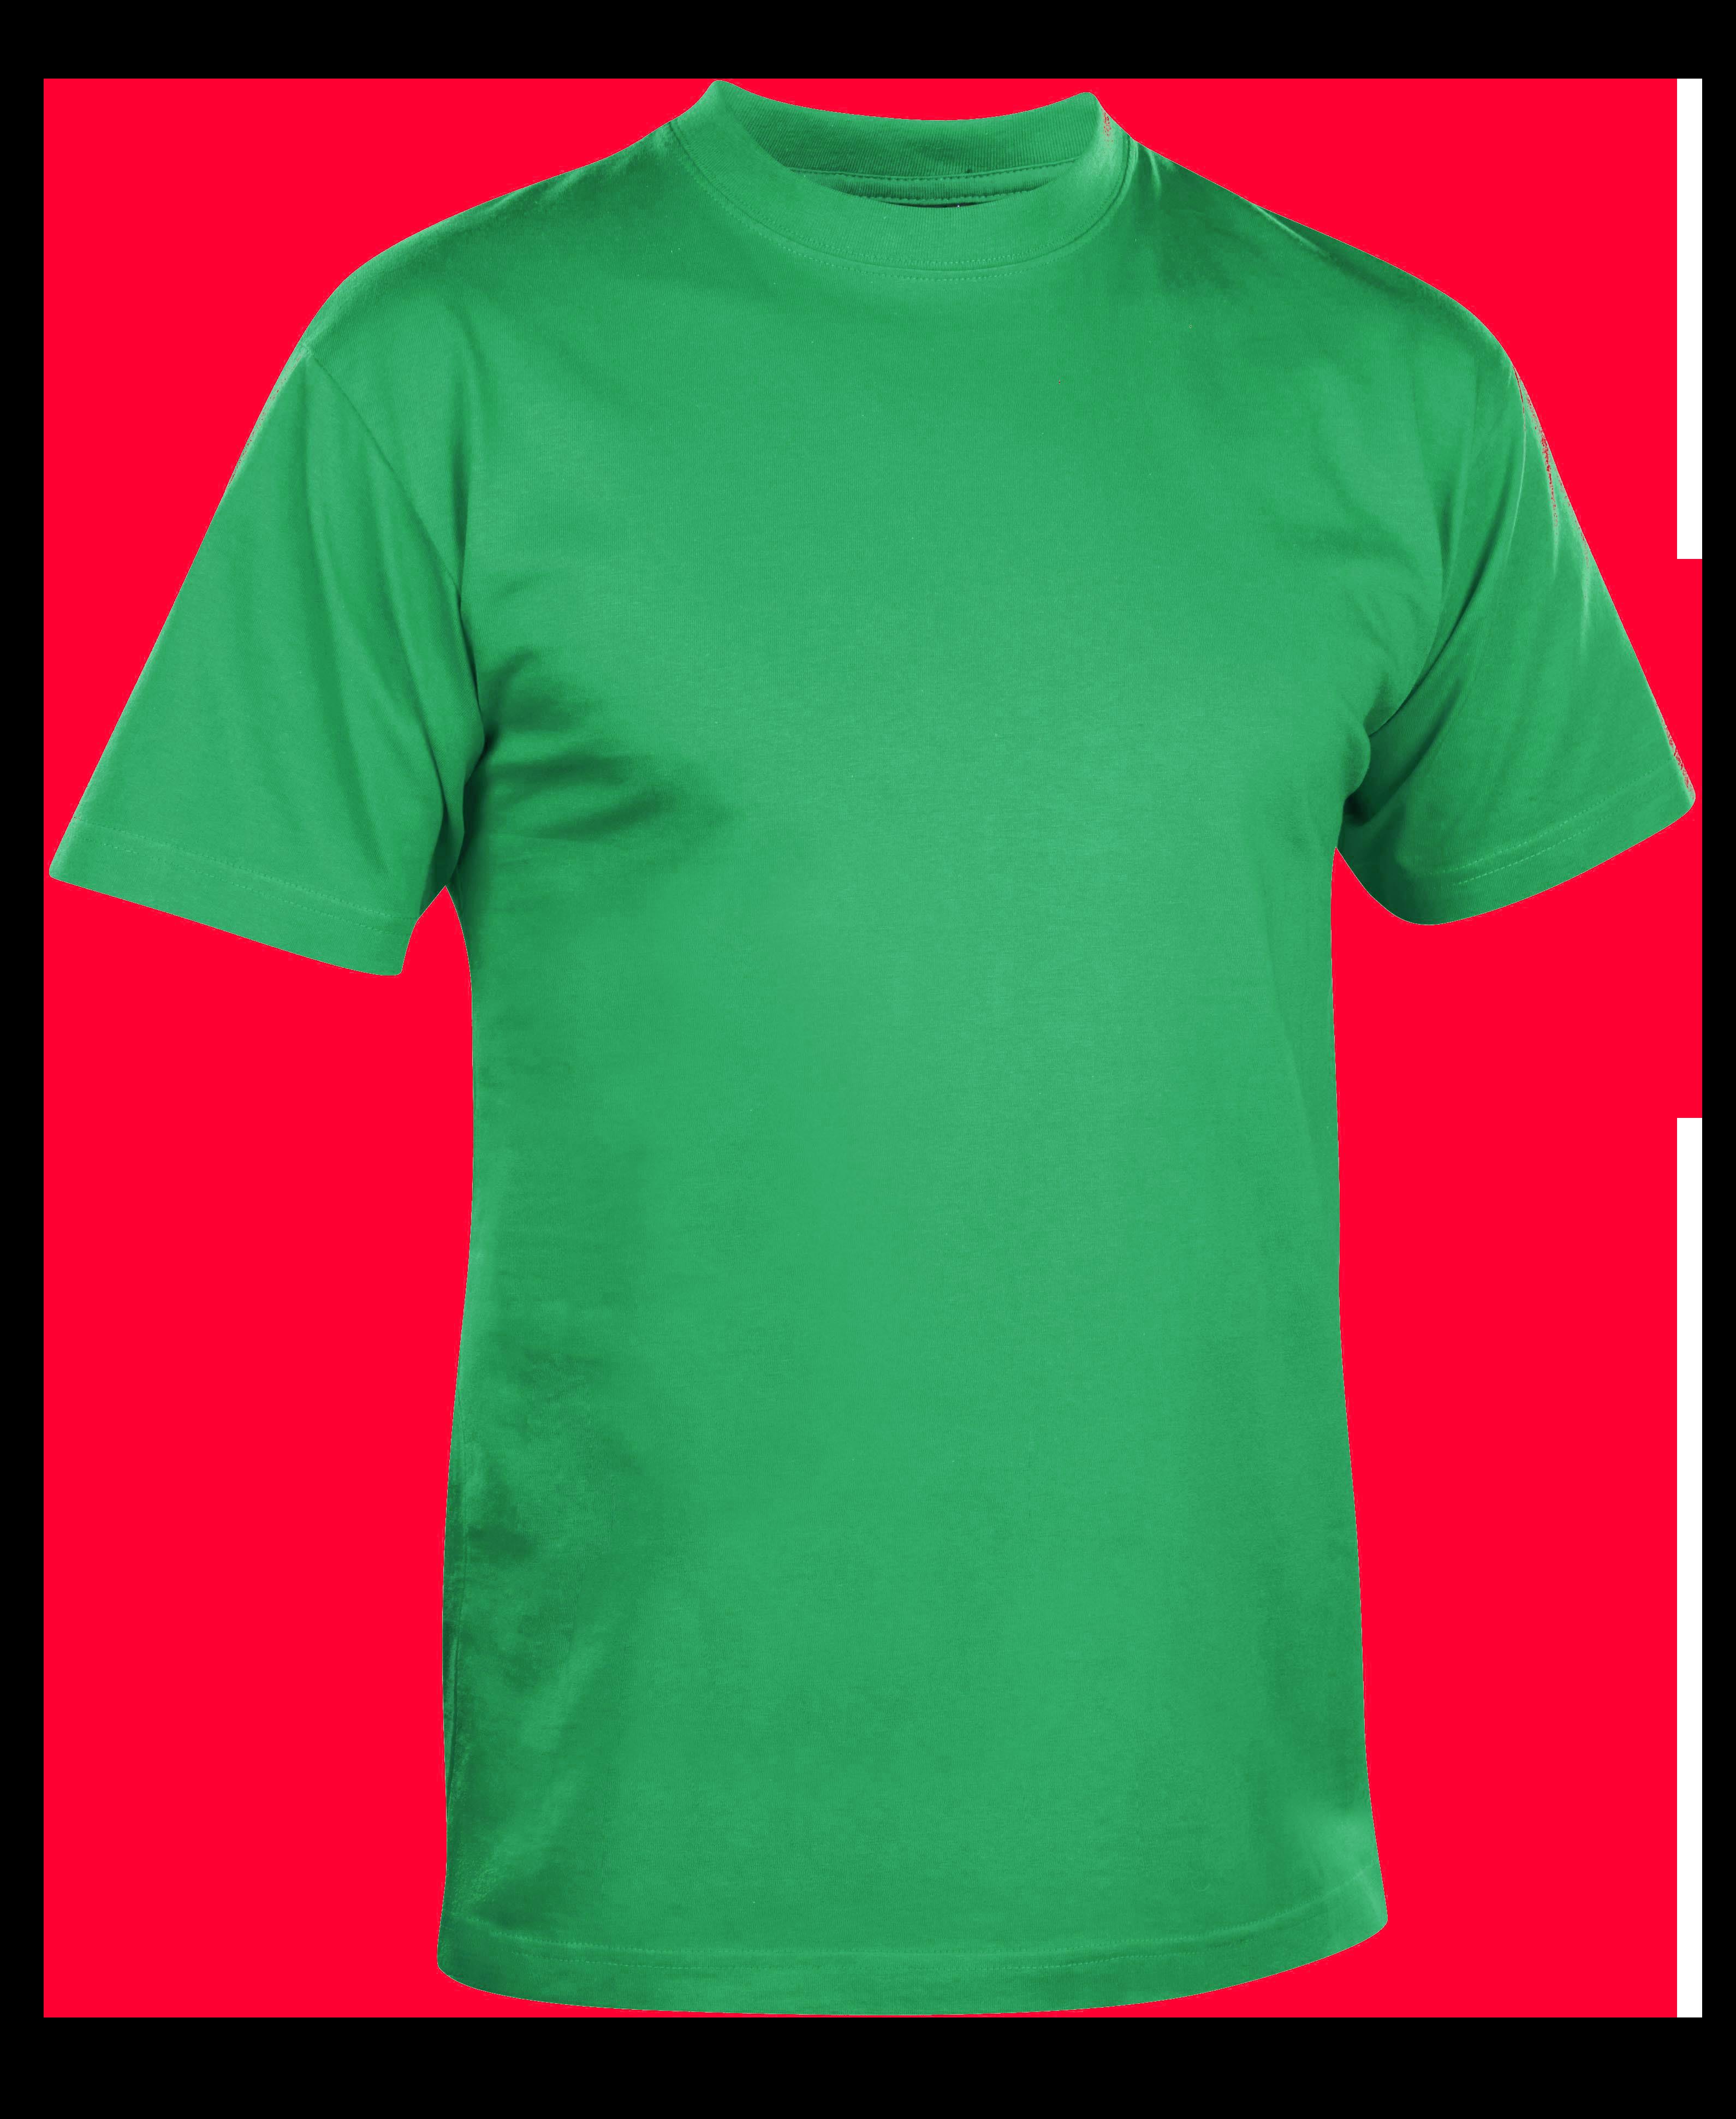 Green T Shirt Png Image T Shirt Png T Shirt Image Shirts